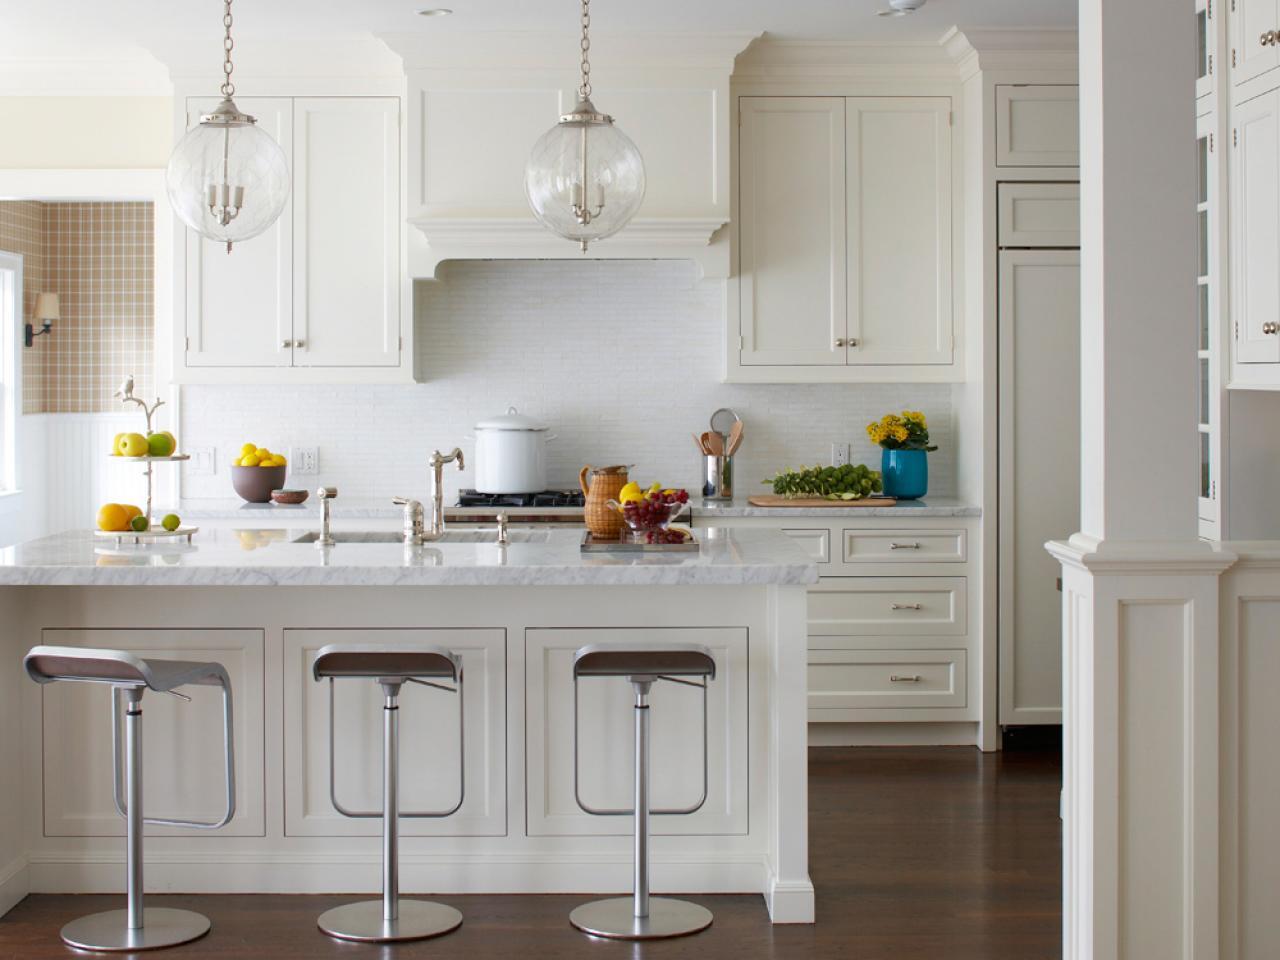 Wonderful White Kitchens - Jenna Burger on Images Of Modern Kitchens  id=57006